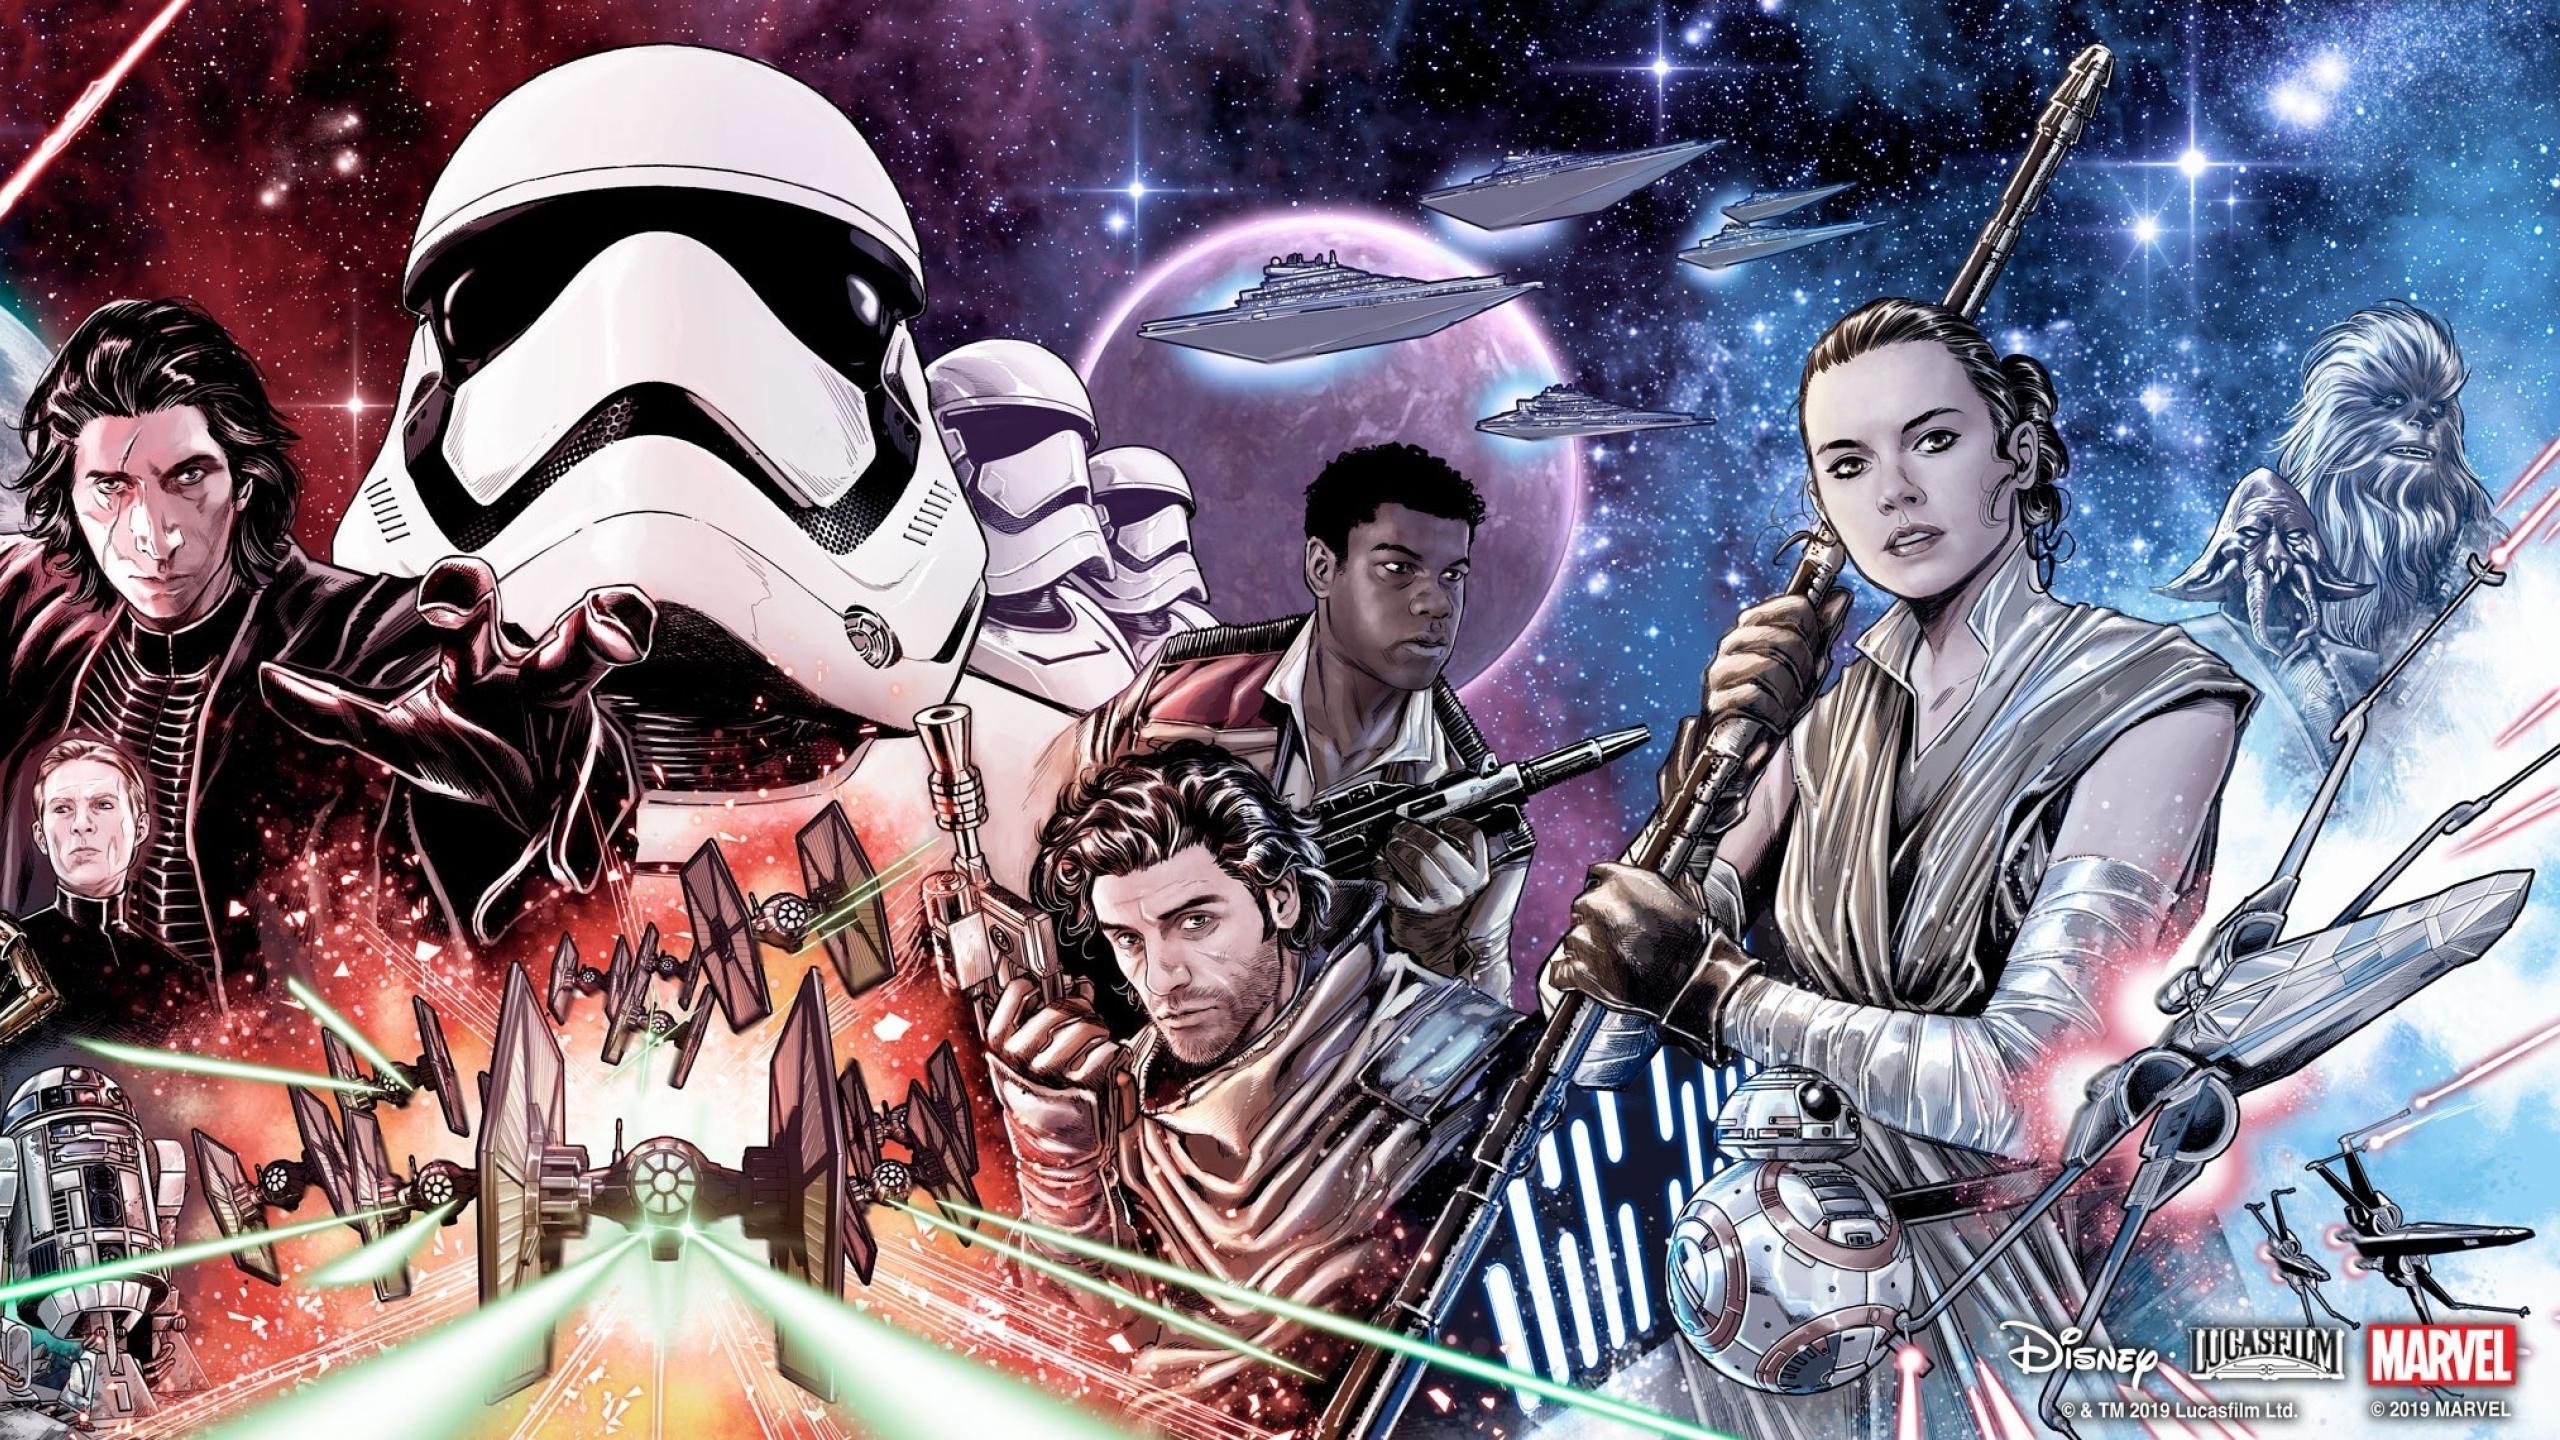 2560x1440 Star Wars Concept Art 1440p Resolution Wallpaper Hd